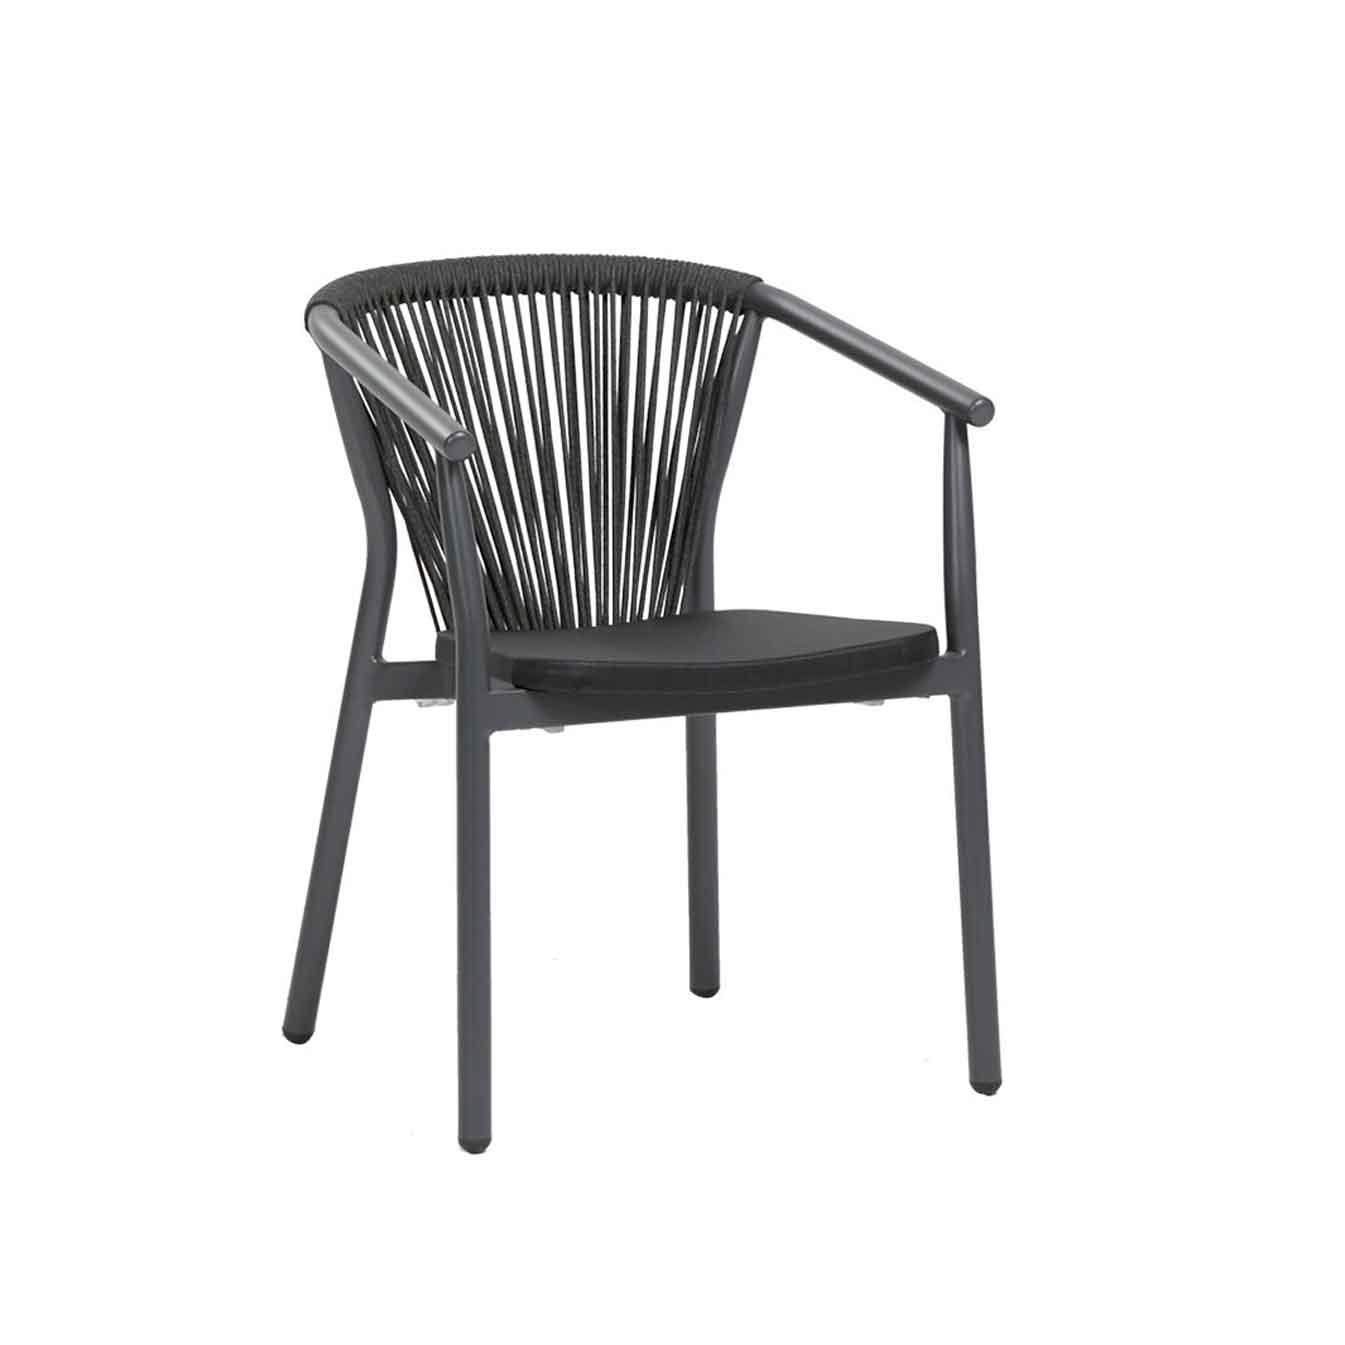 Trinity Dining Arm Chair - Black